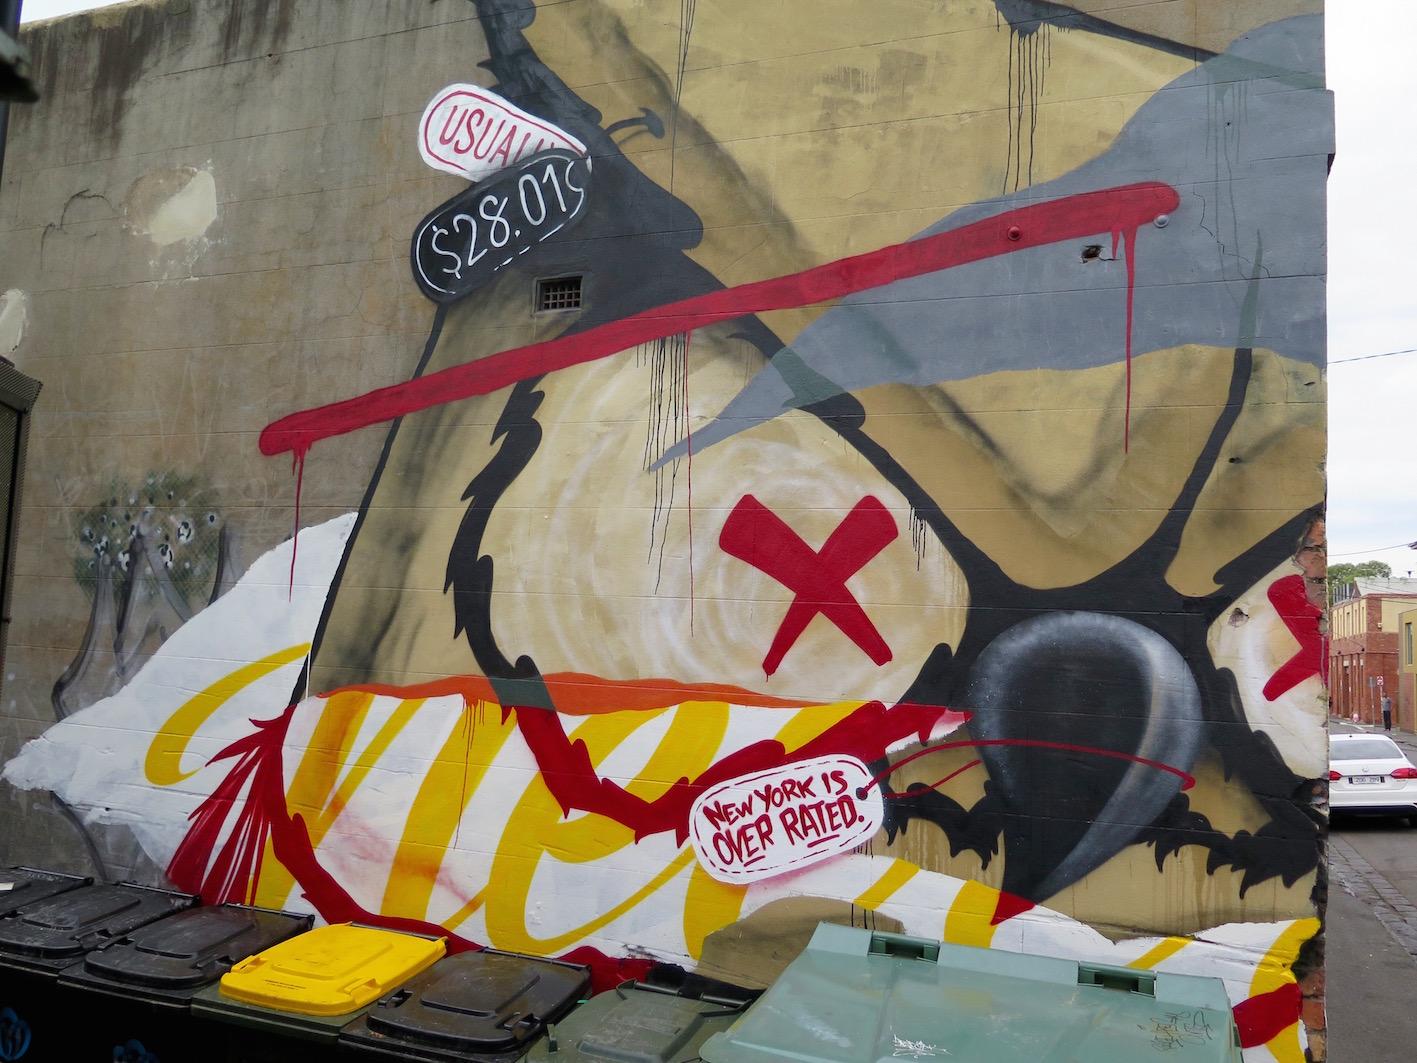 deansunshine_landofsunshine_melbourne_streetart_graffiti_never satisfied transformer 6